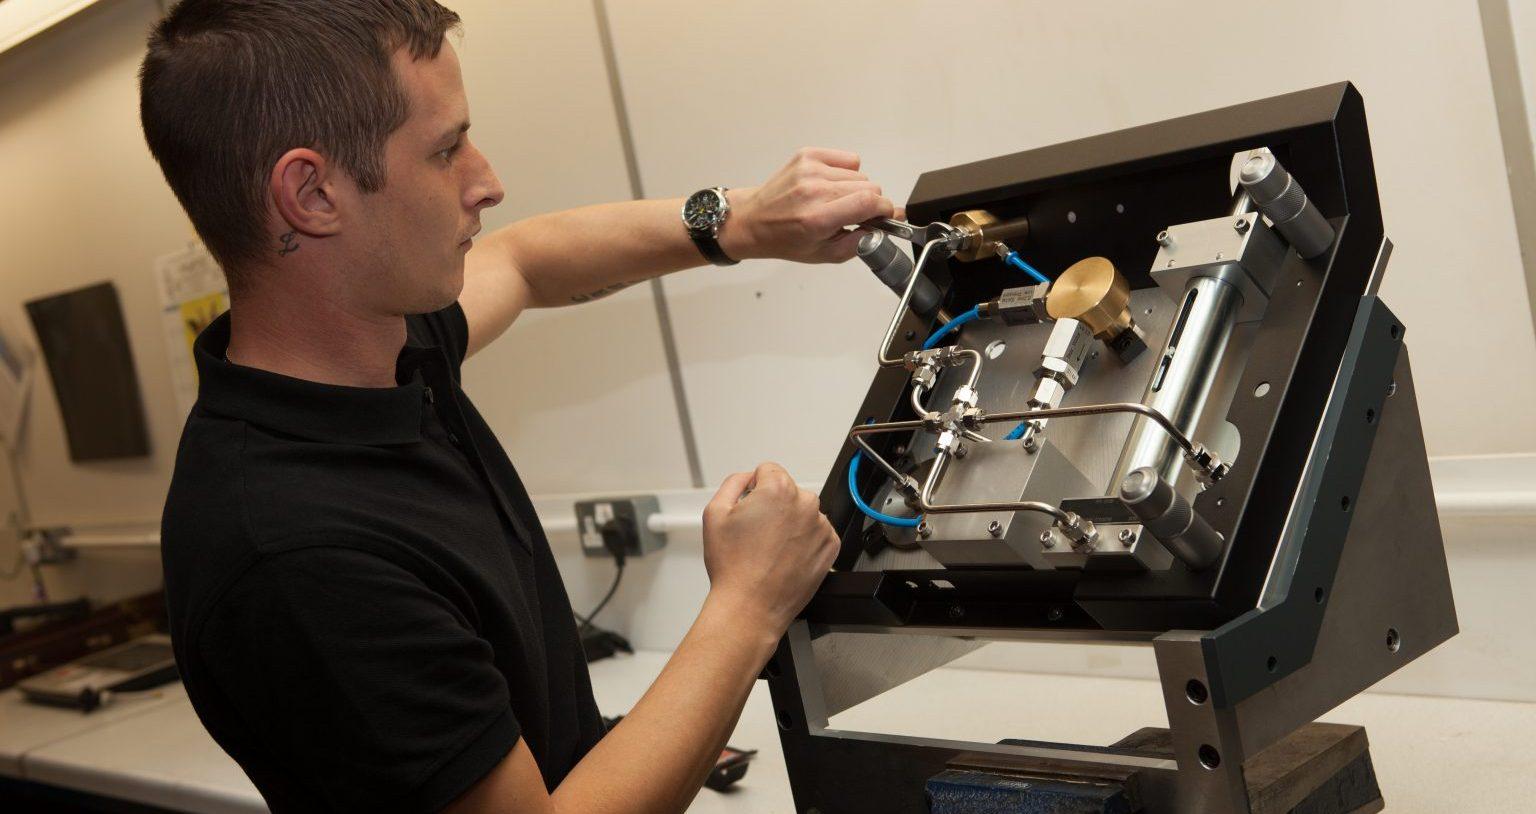 Vonderbrand-Kirkstall-Lifestyle - Kirkstall Precision Engineering